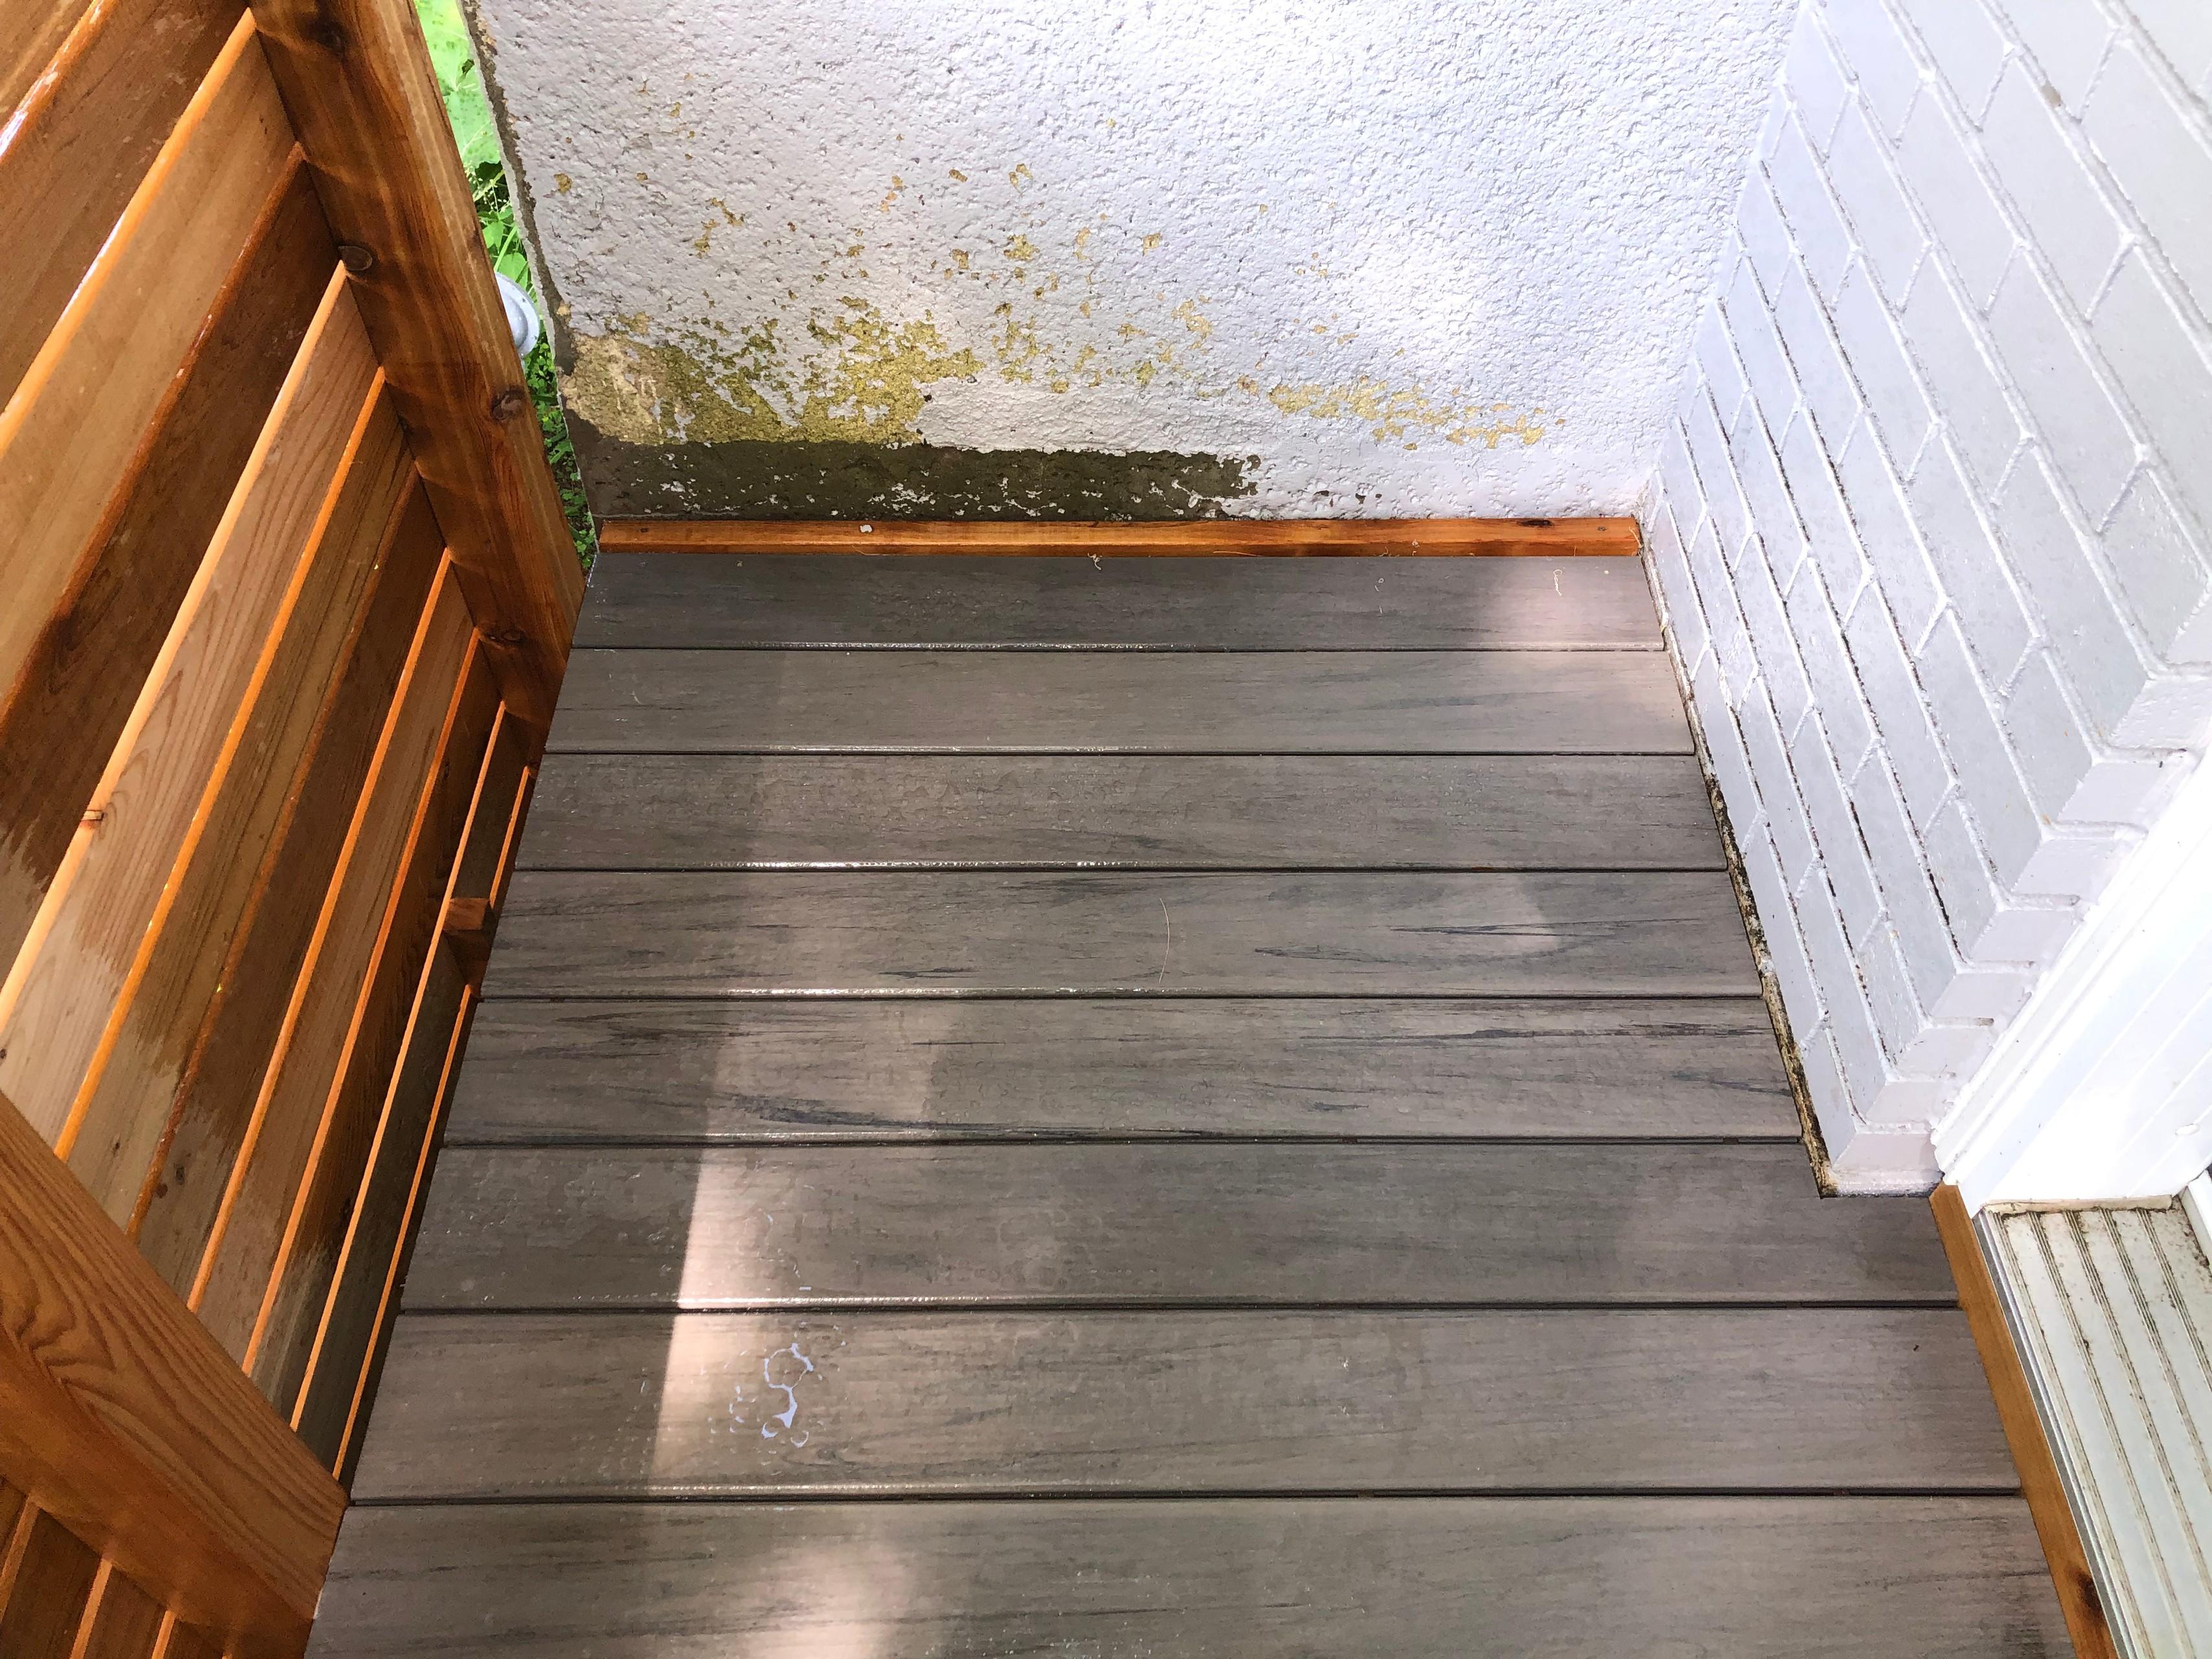 AZEK: Ashwood composite & cedar